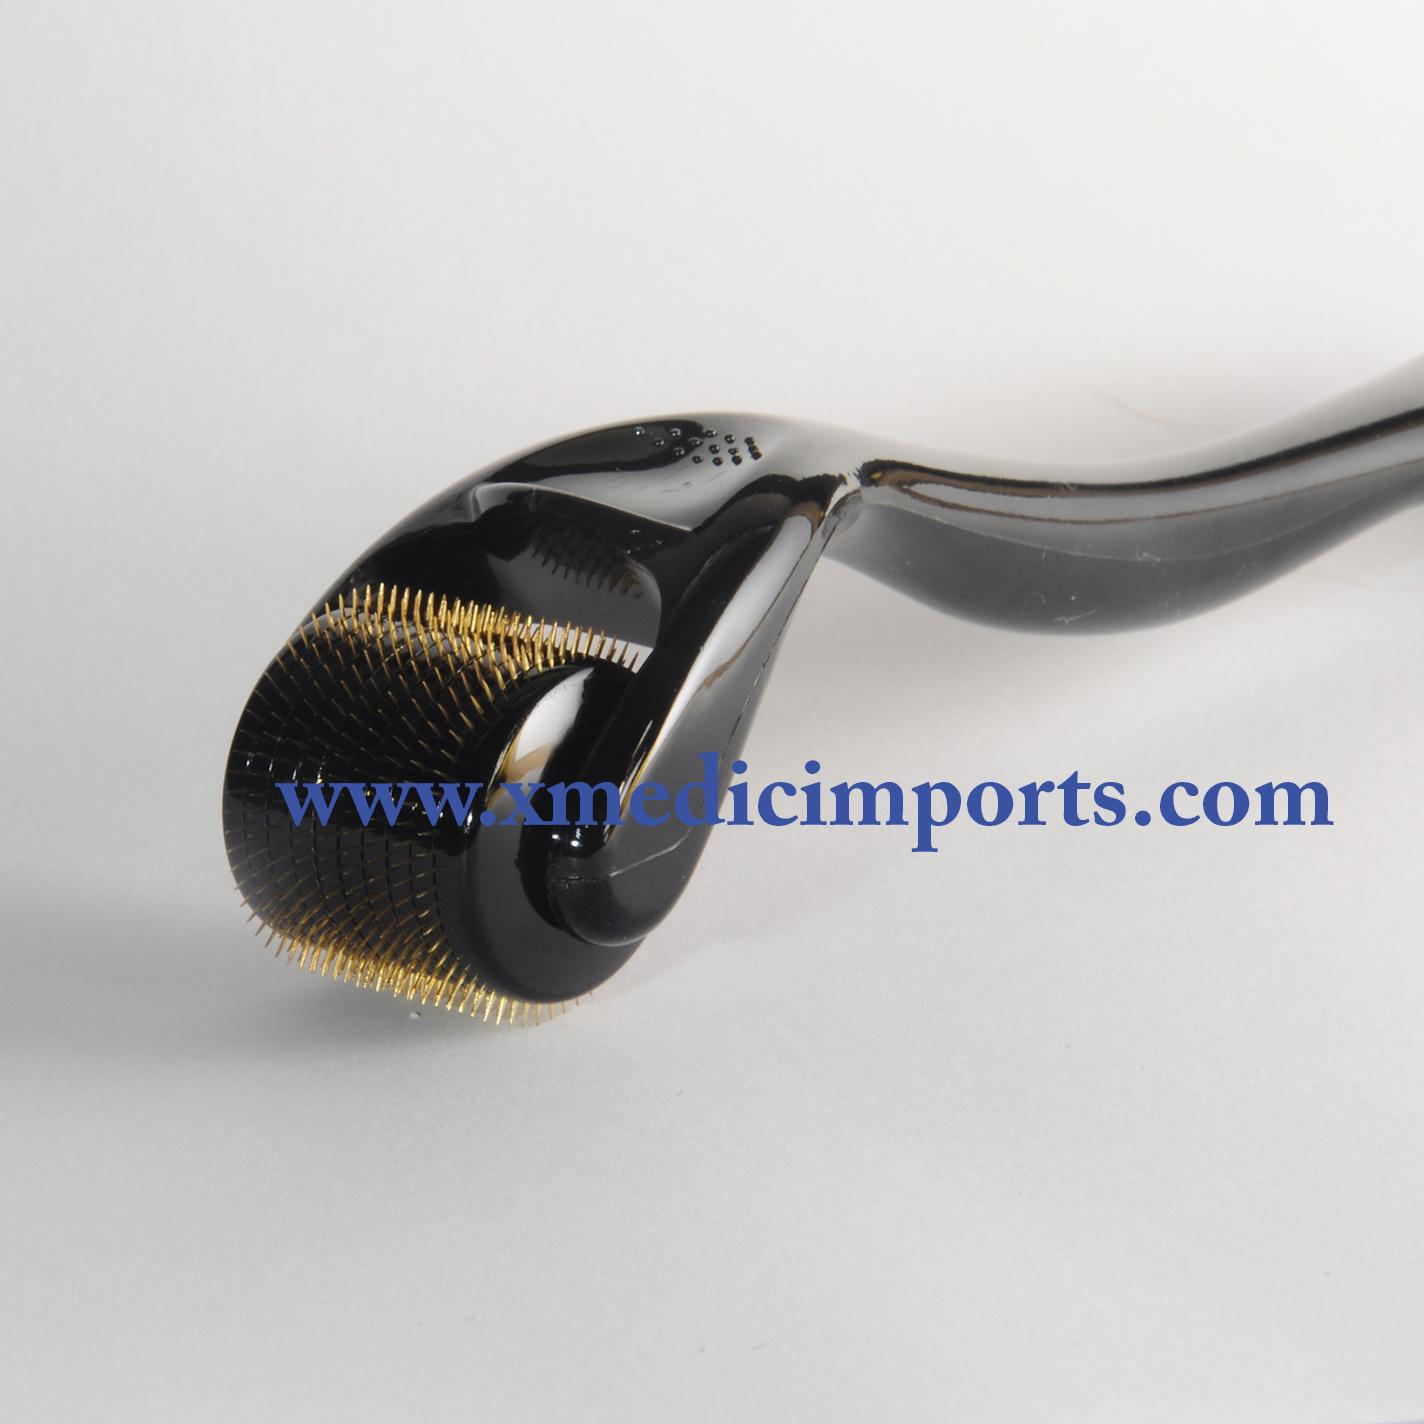 Qoo10 Titanium Dermaroller Cosmetics Zgts Show All Item Images